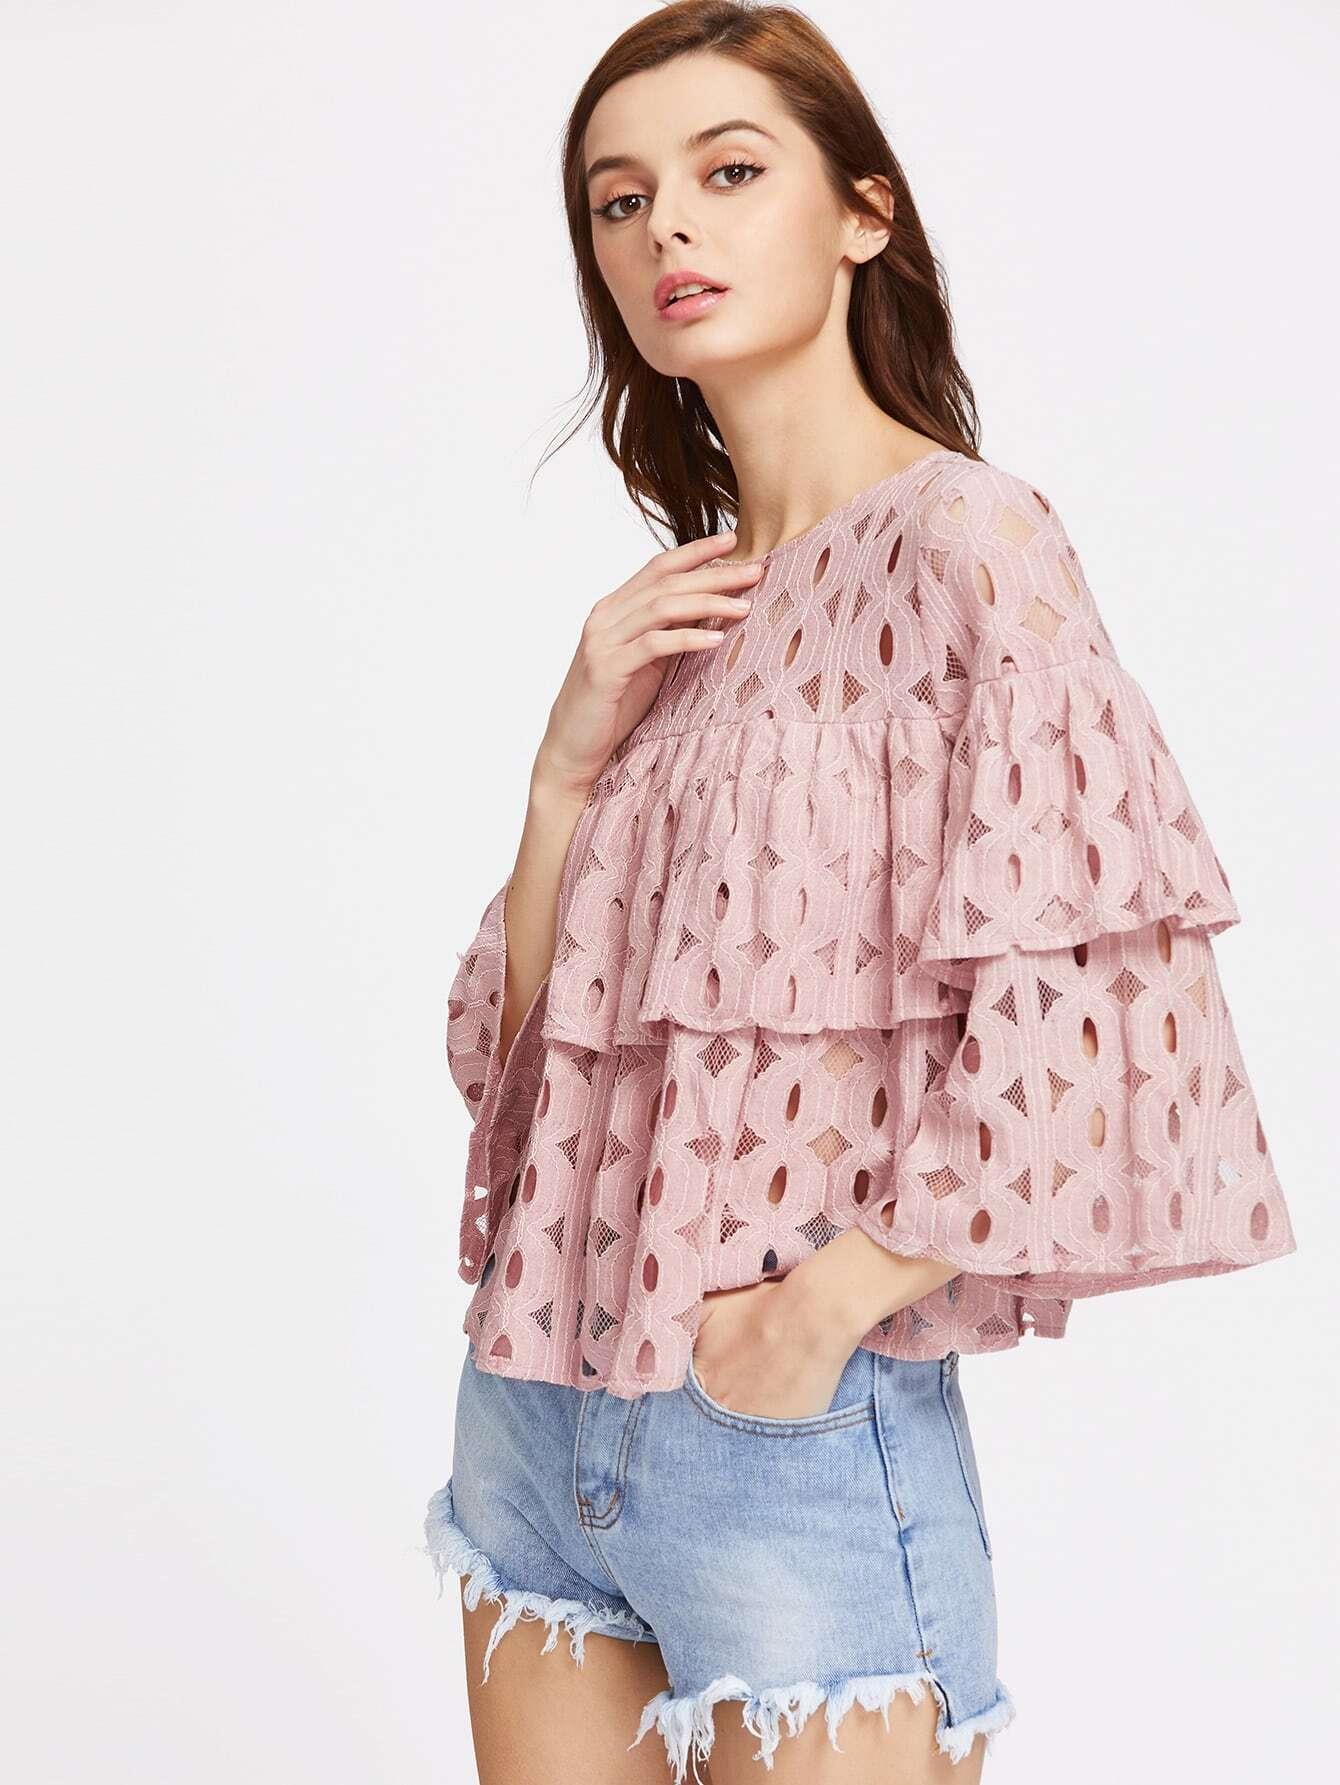 blouse170405711_2